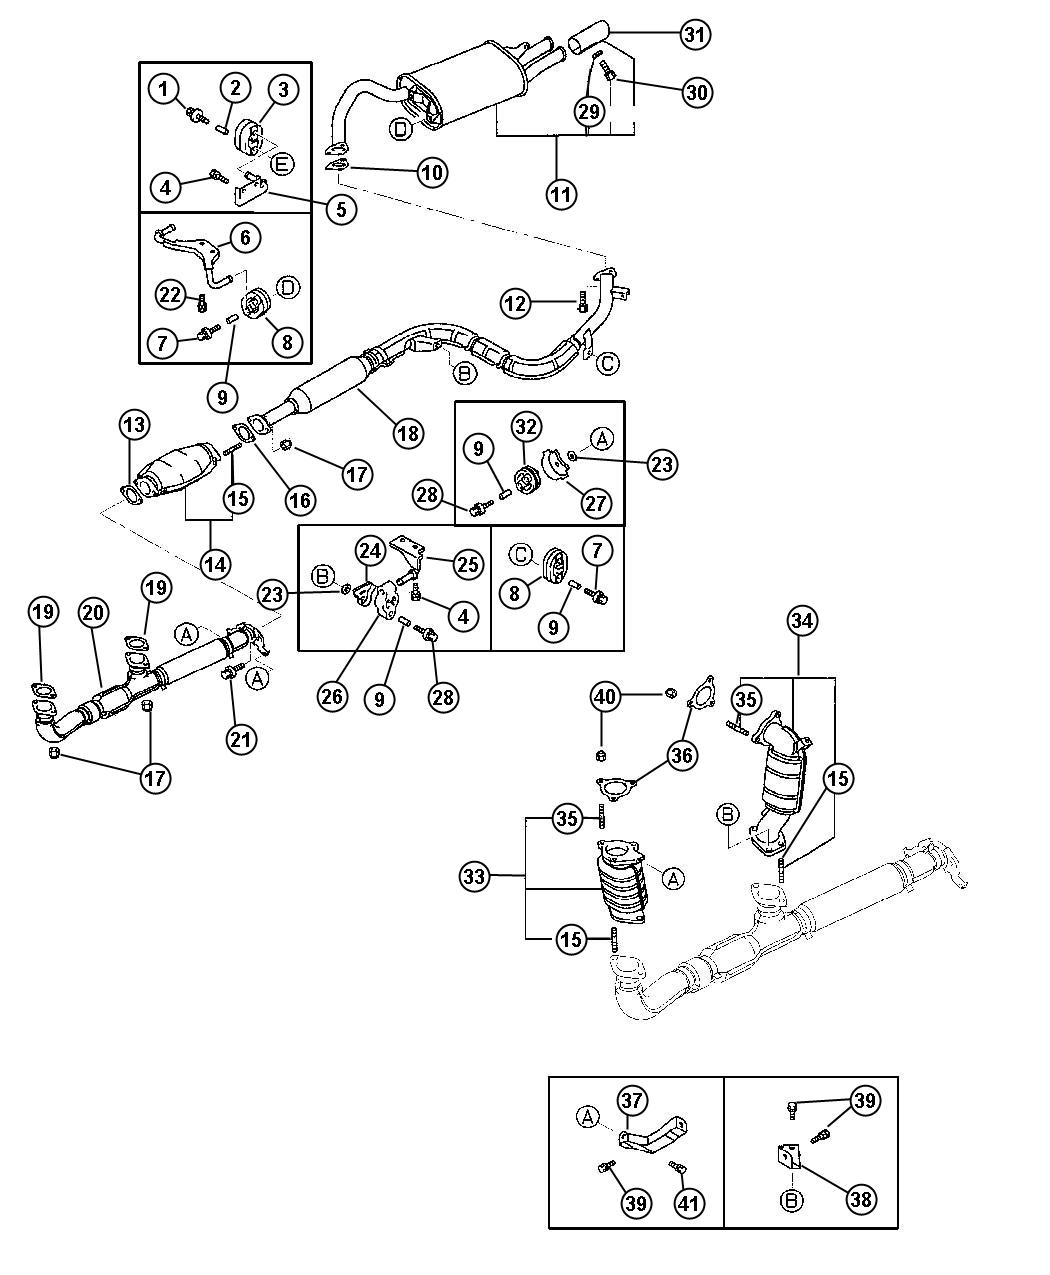 Chrysler Sebring Pipe. Exhaust. 3 oxygen hole, 3 oxygen